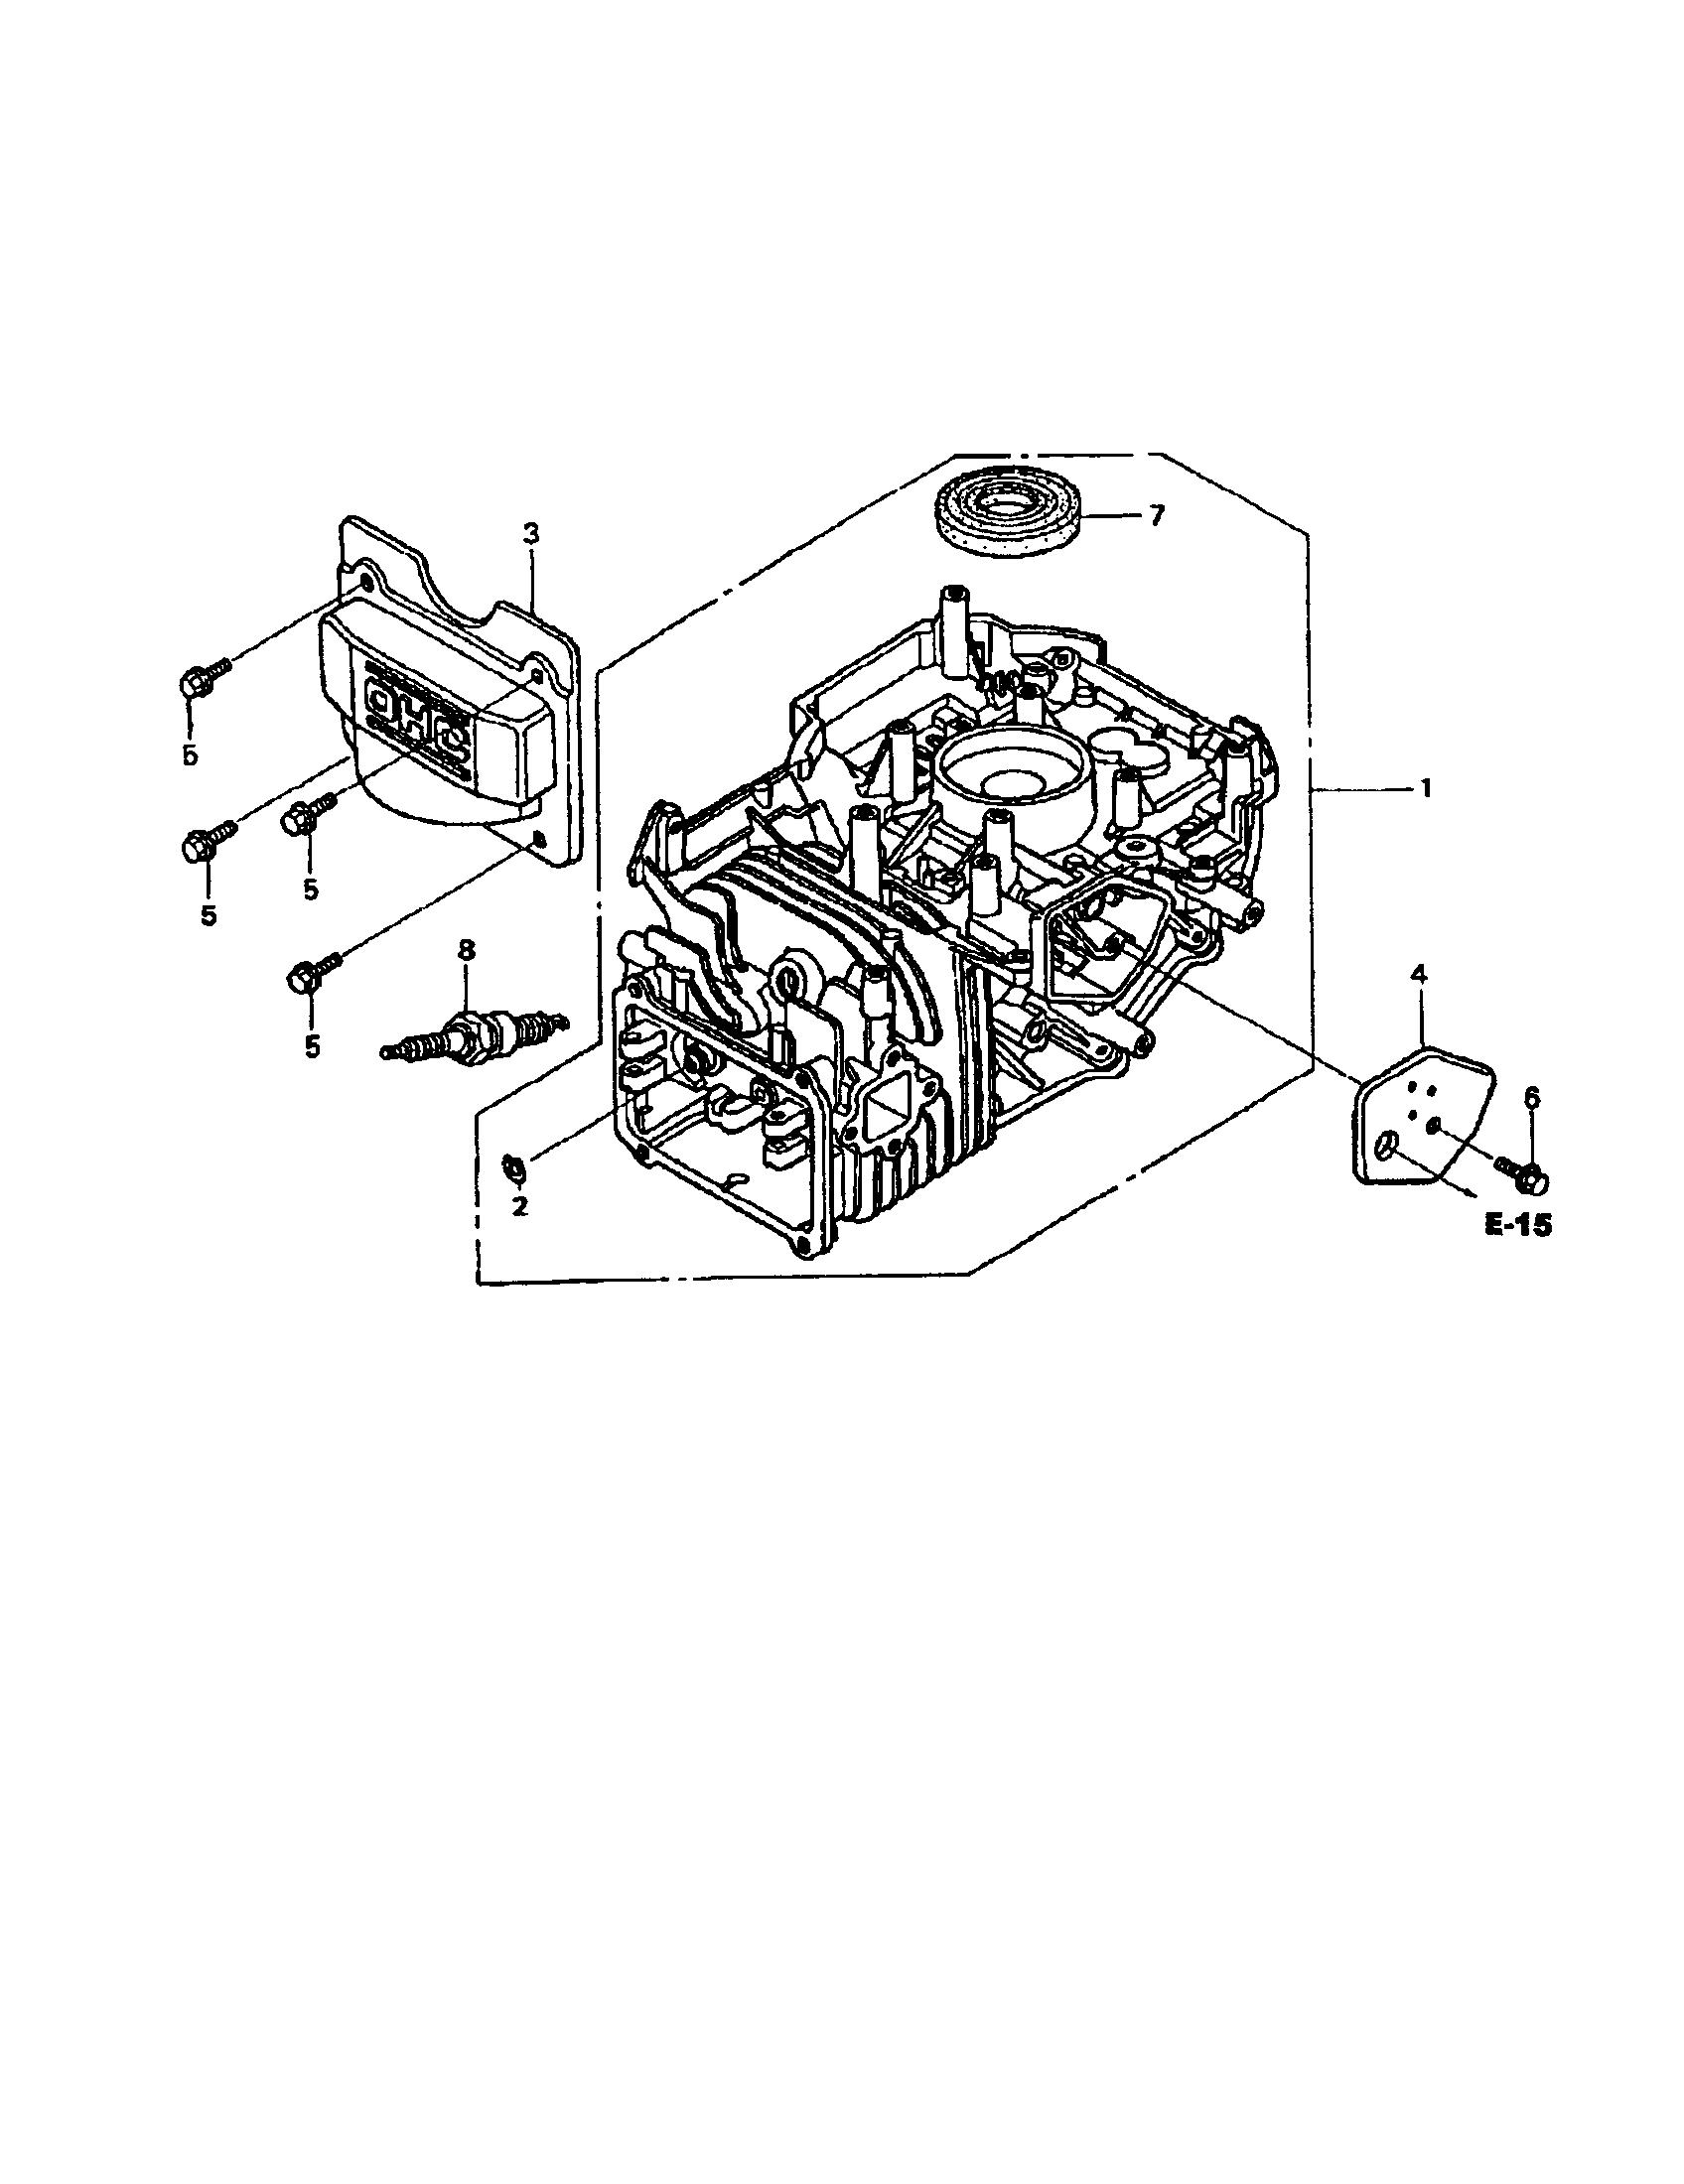 honda engine gcv160 carburetor diagram alfa romeo wiring 156 gcv190 schematic get free image about